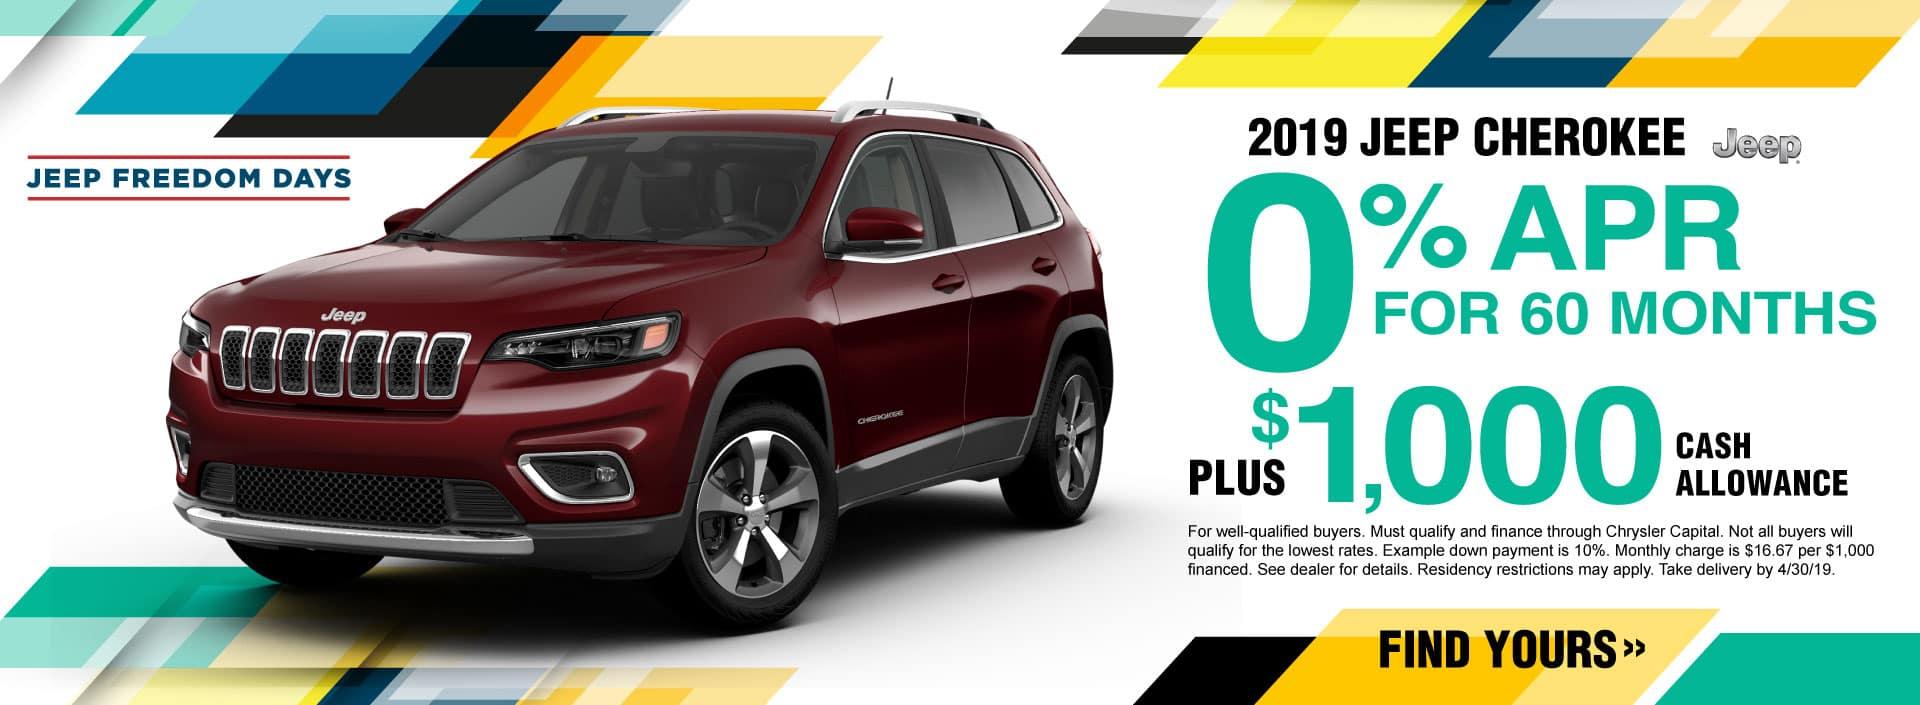 2019 Jeep Cherokee APR